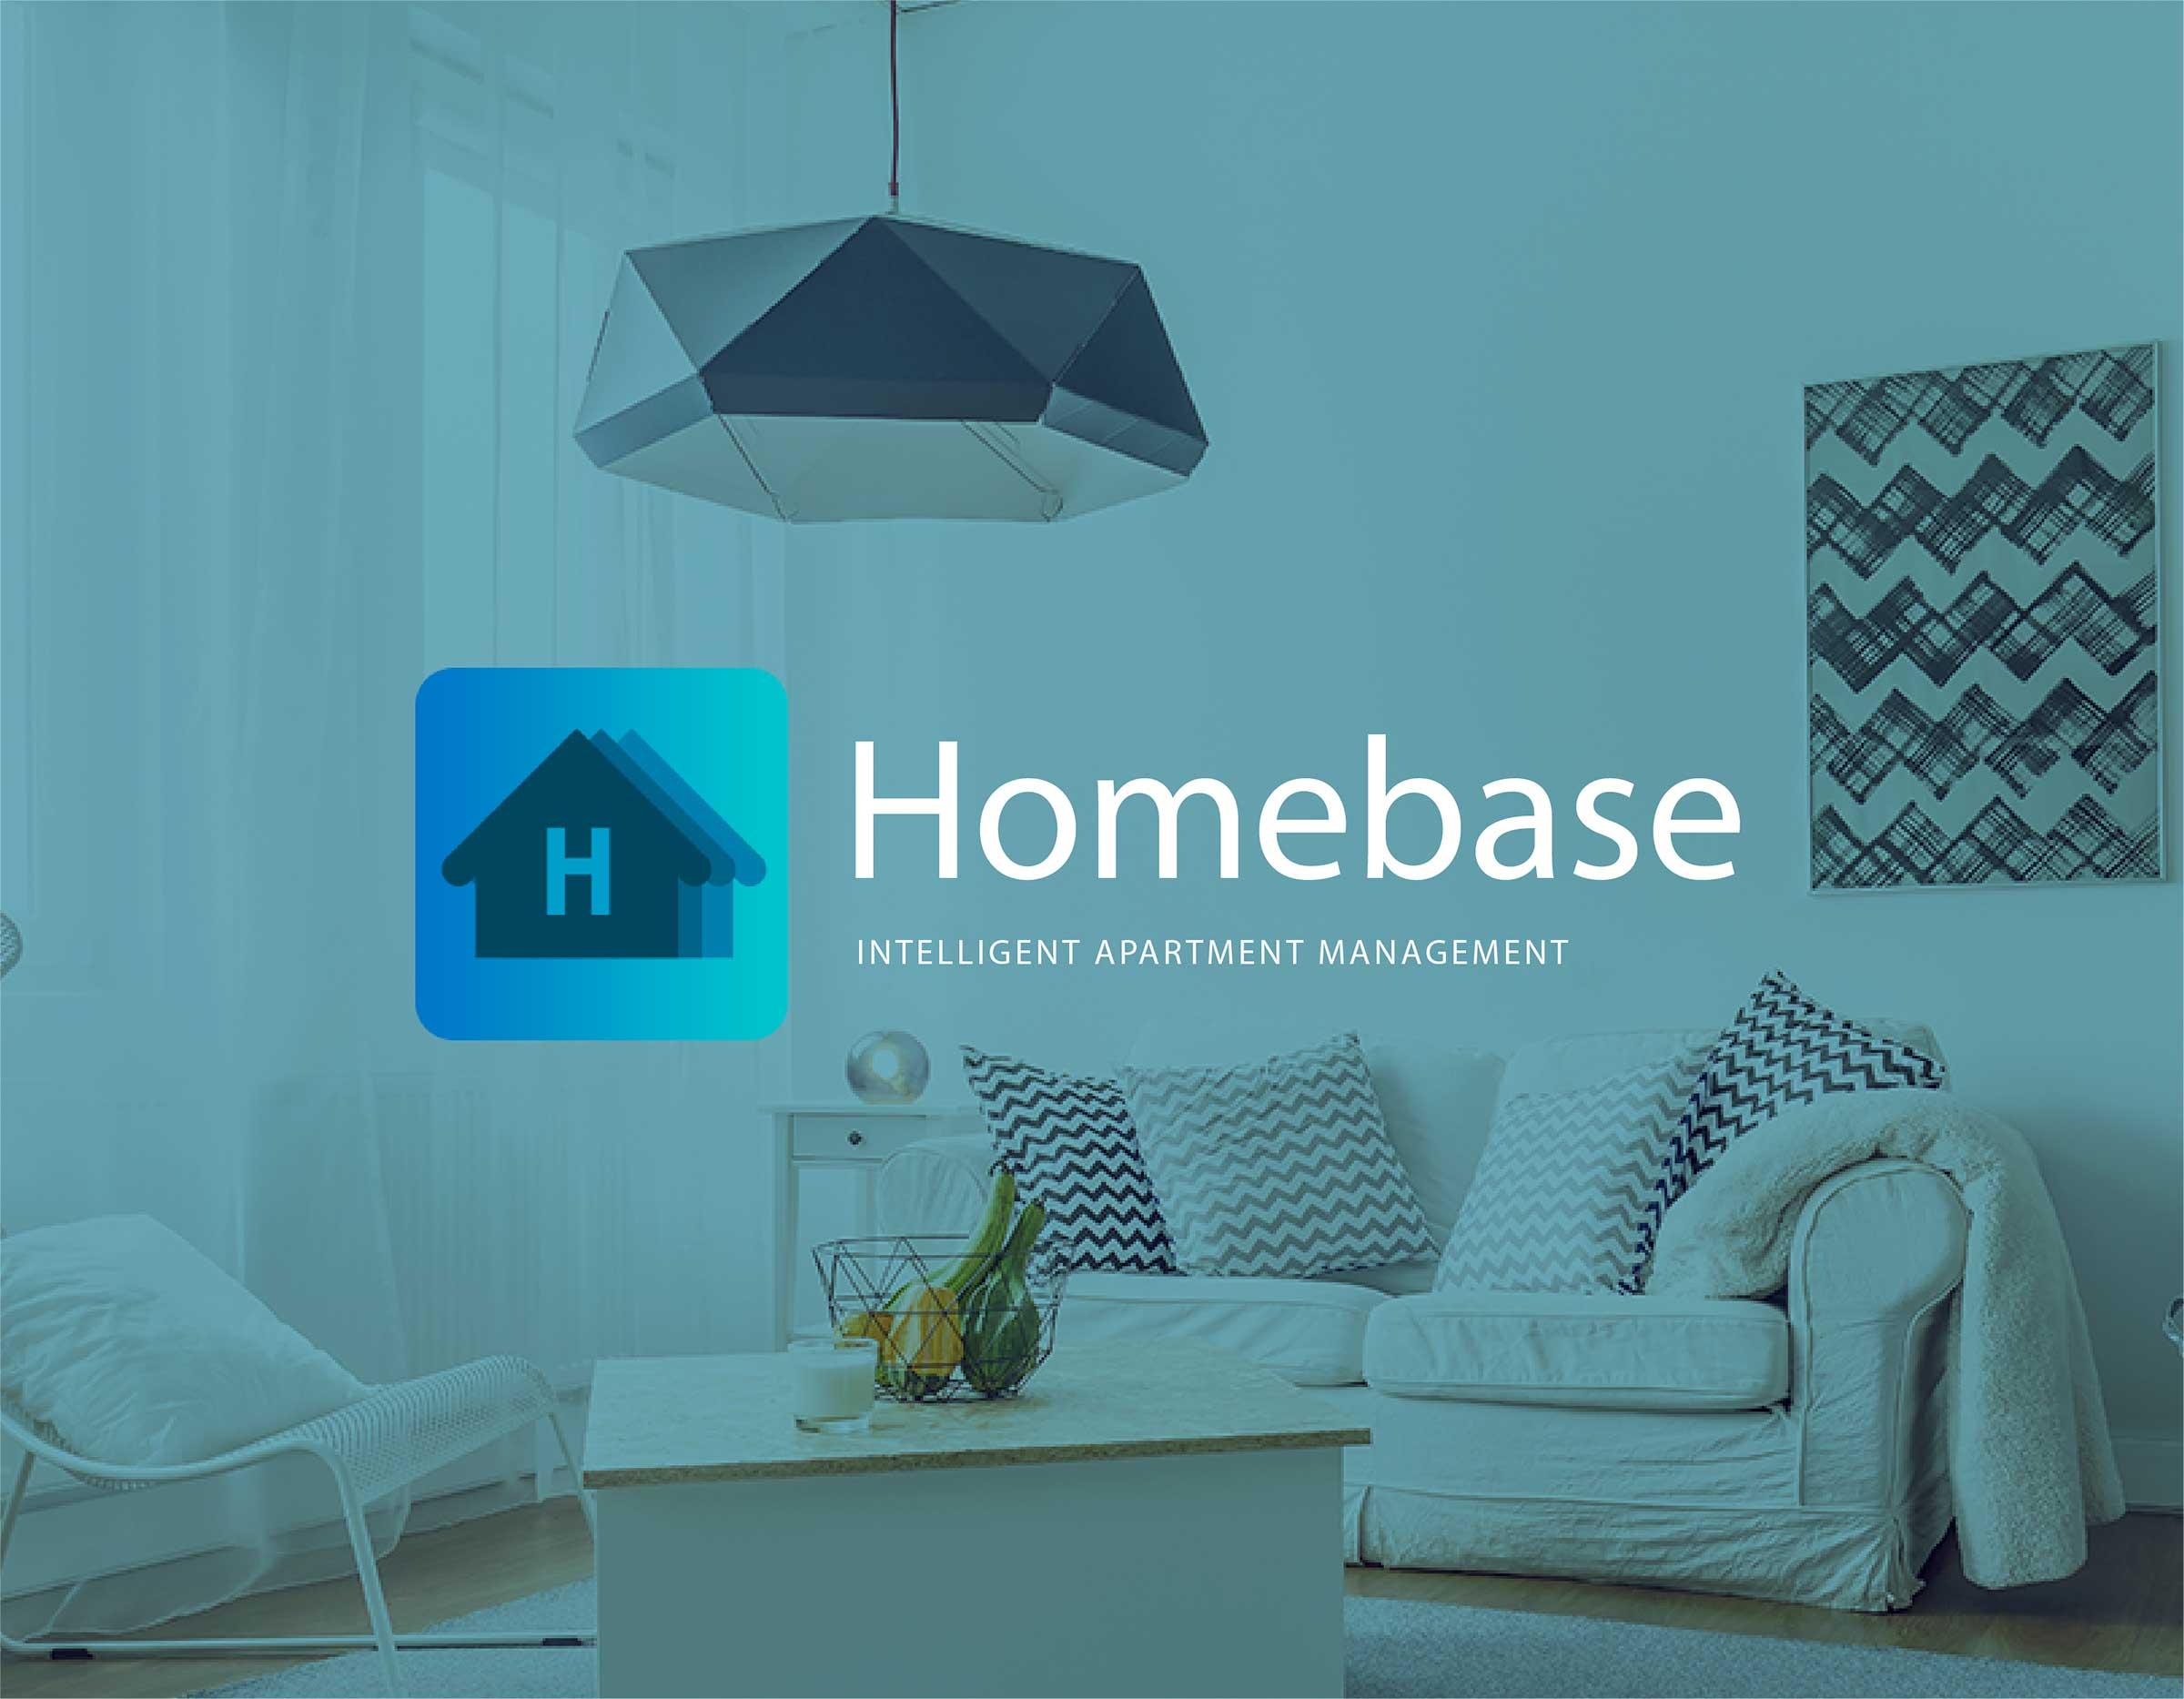 Meet Homebase